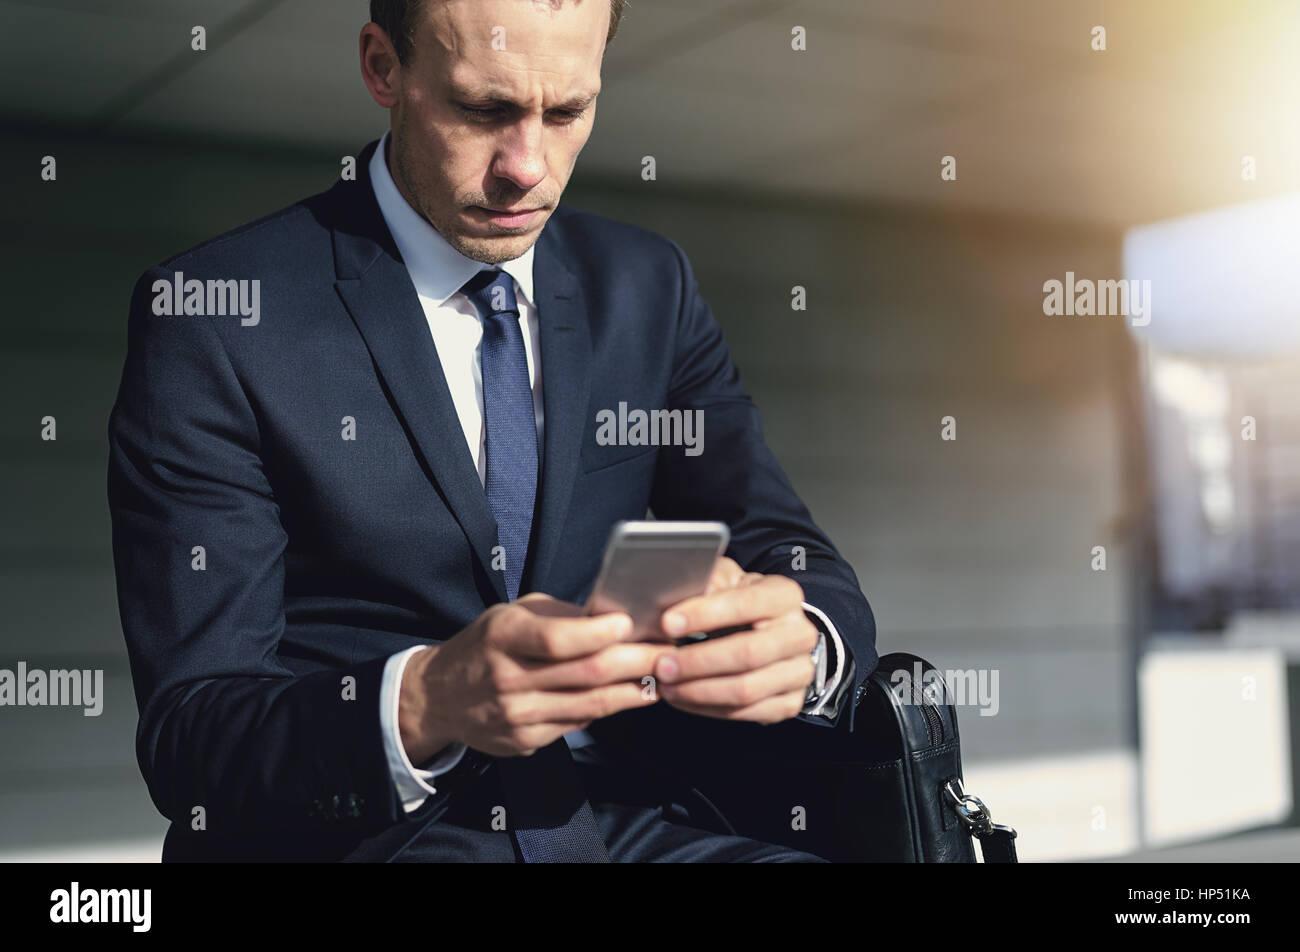 Confident handsome businessman using his phone. Horizontal indoors shot - Stock Image